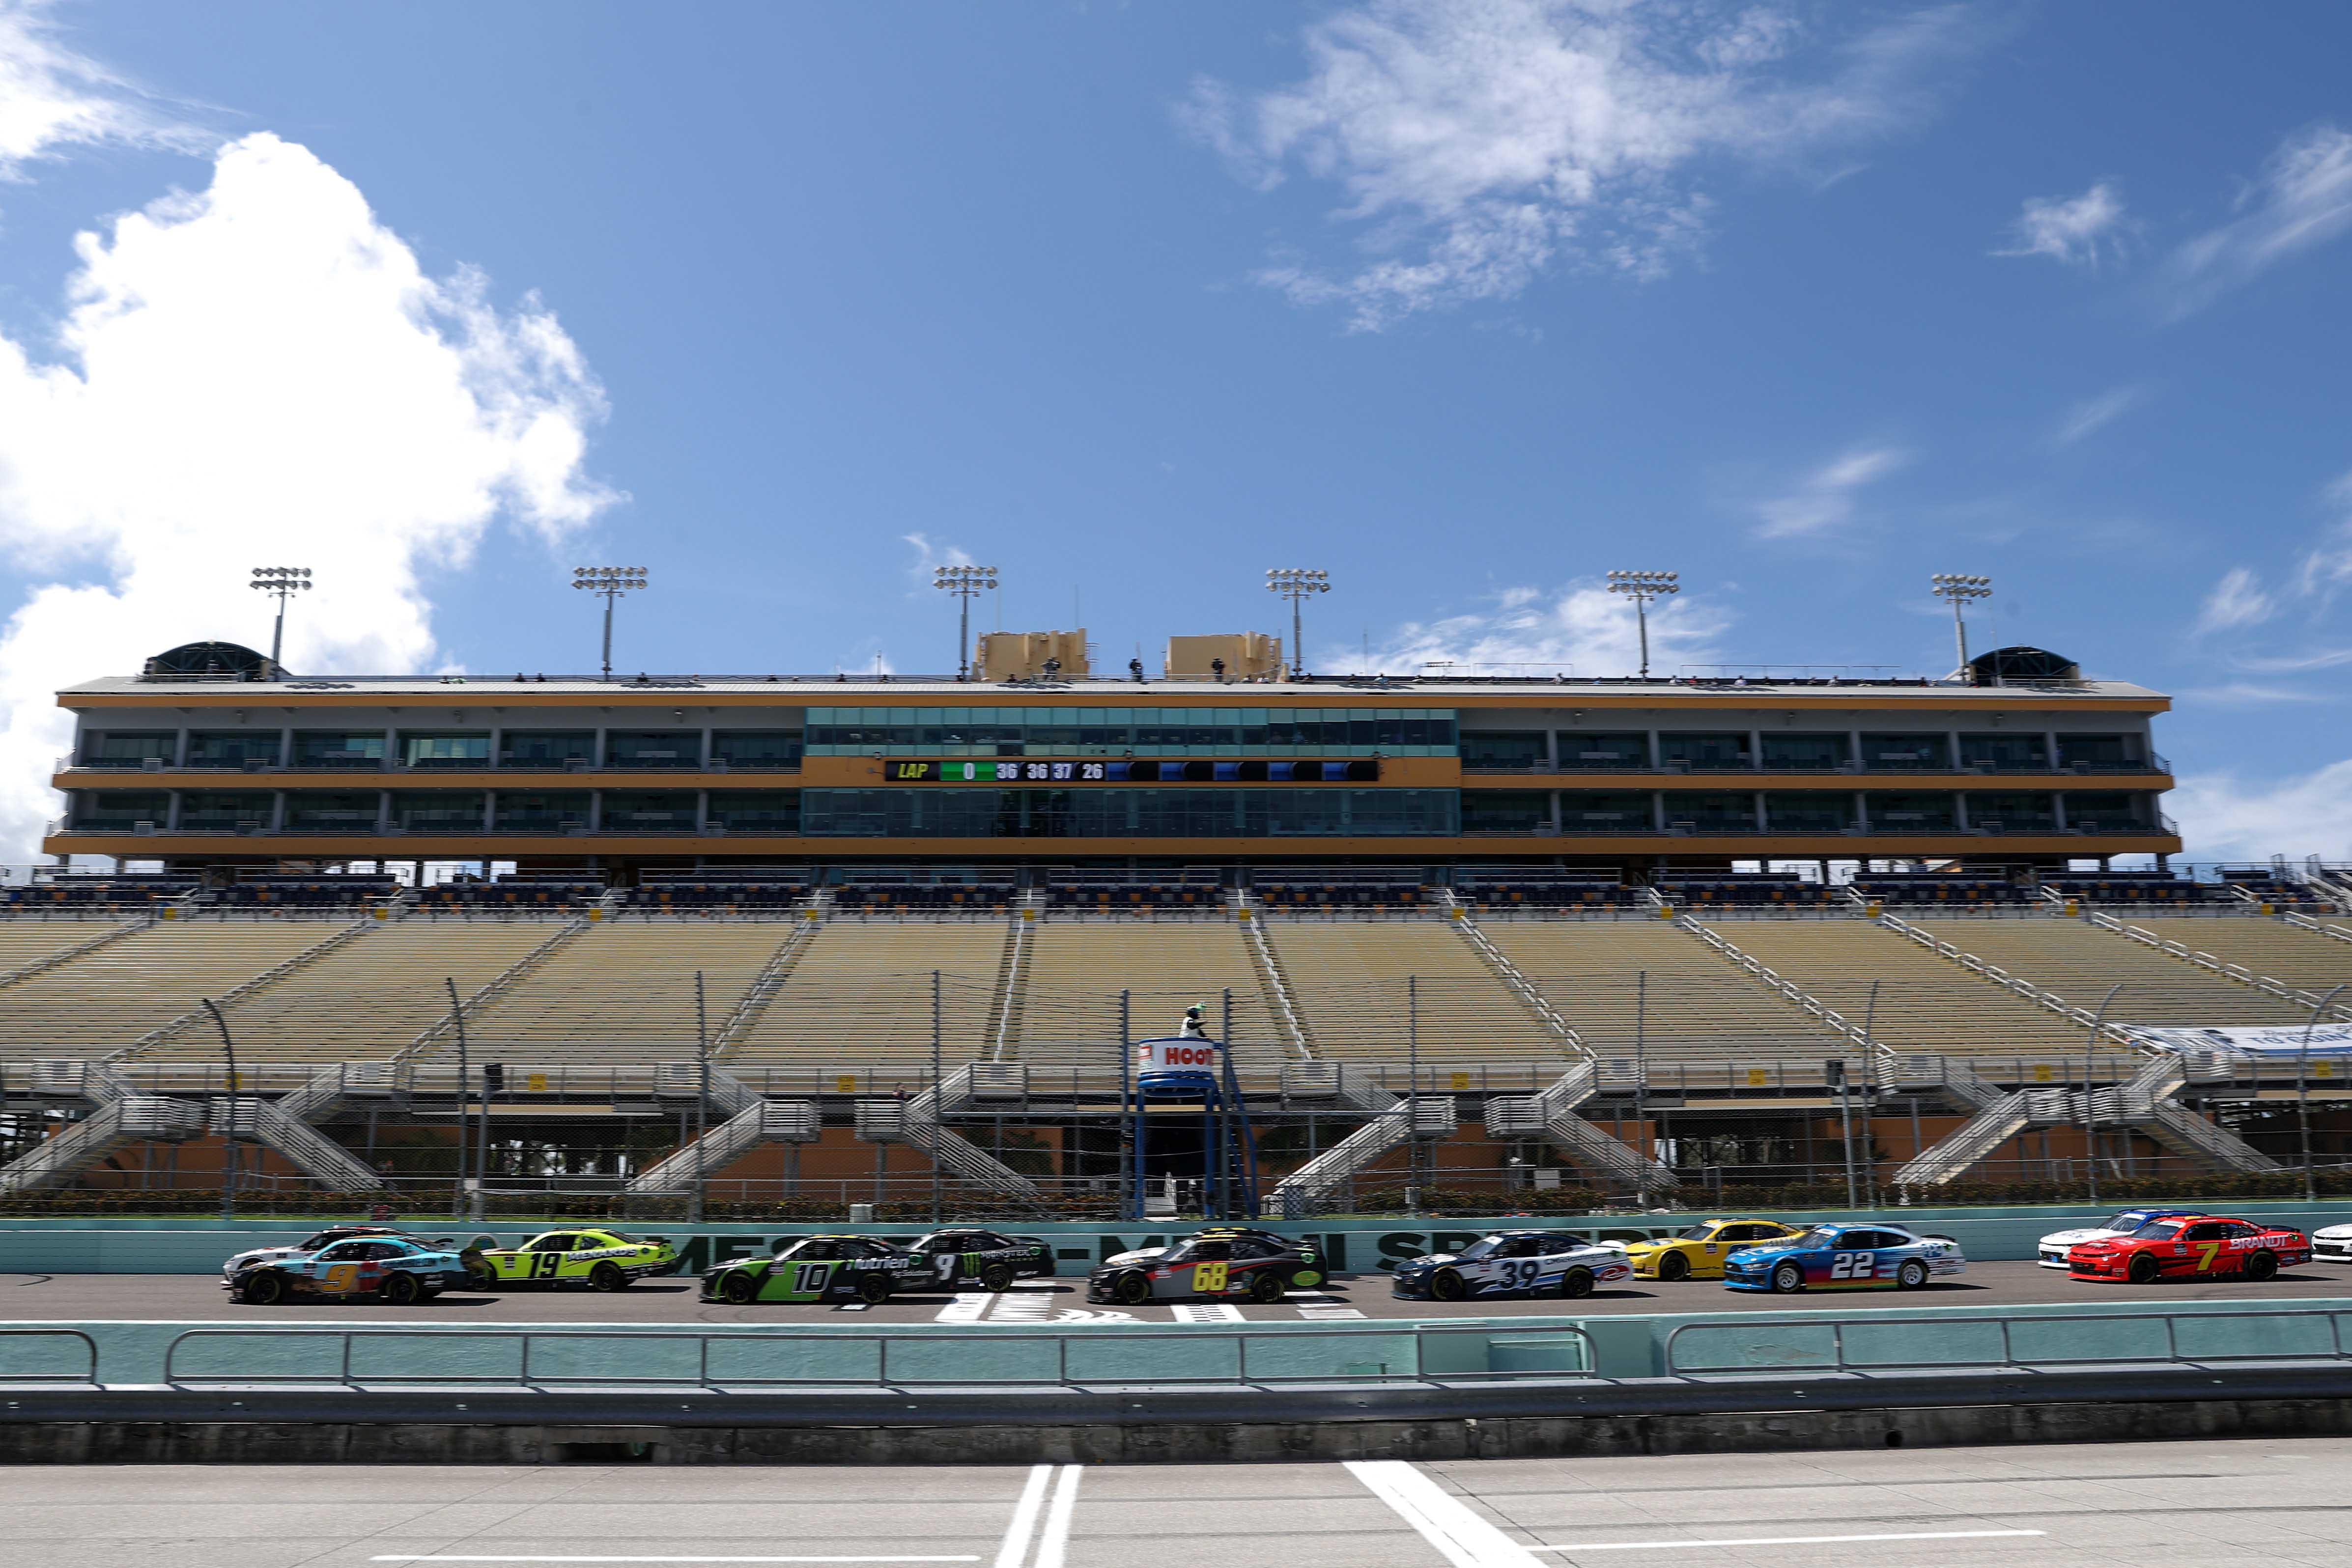 NASCAR Xfinity Series at Homestead-Miami Speedway